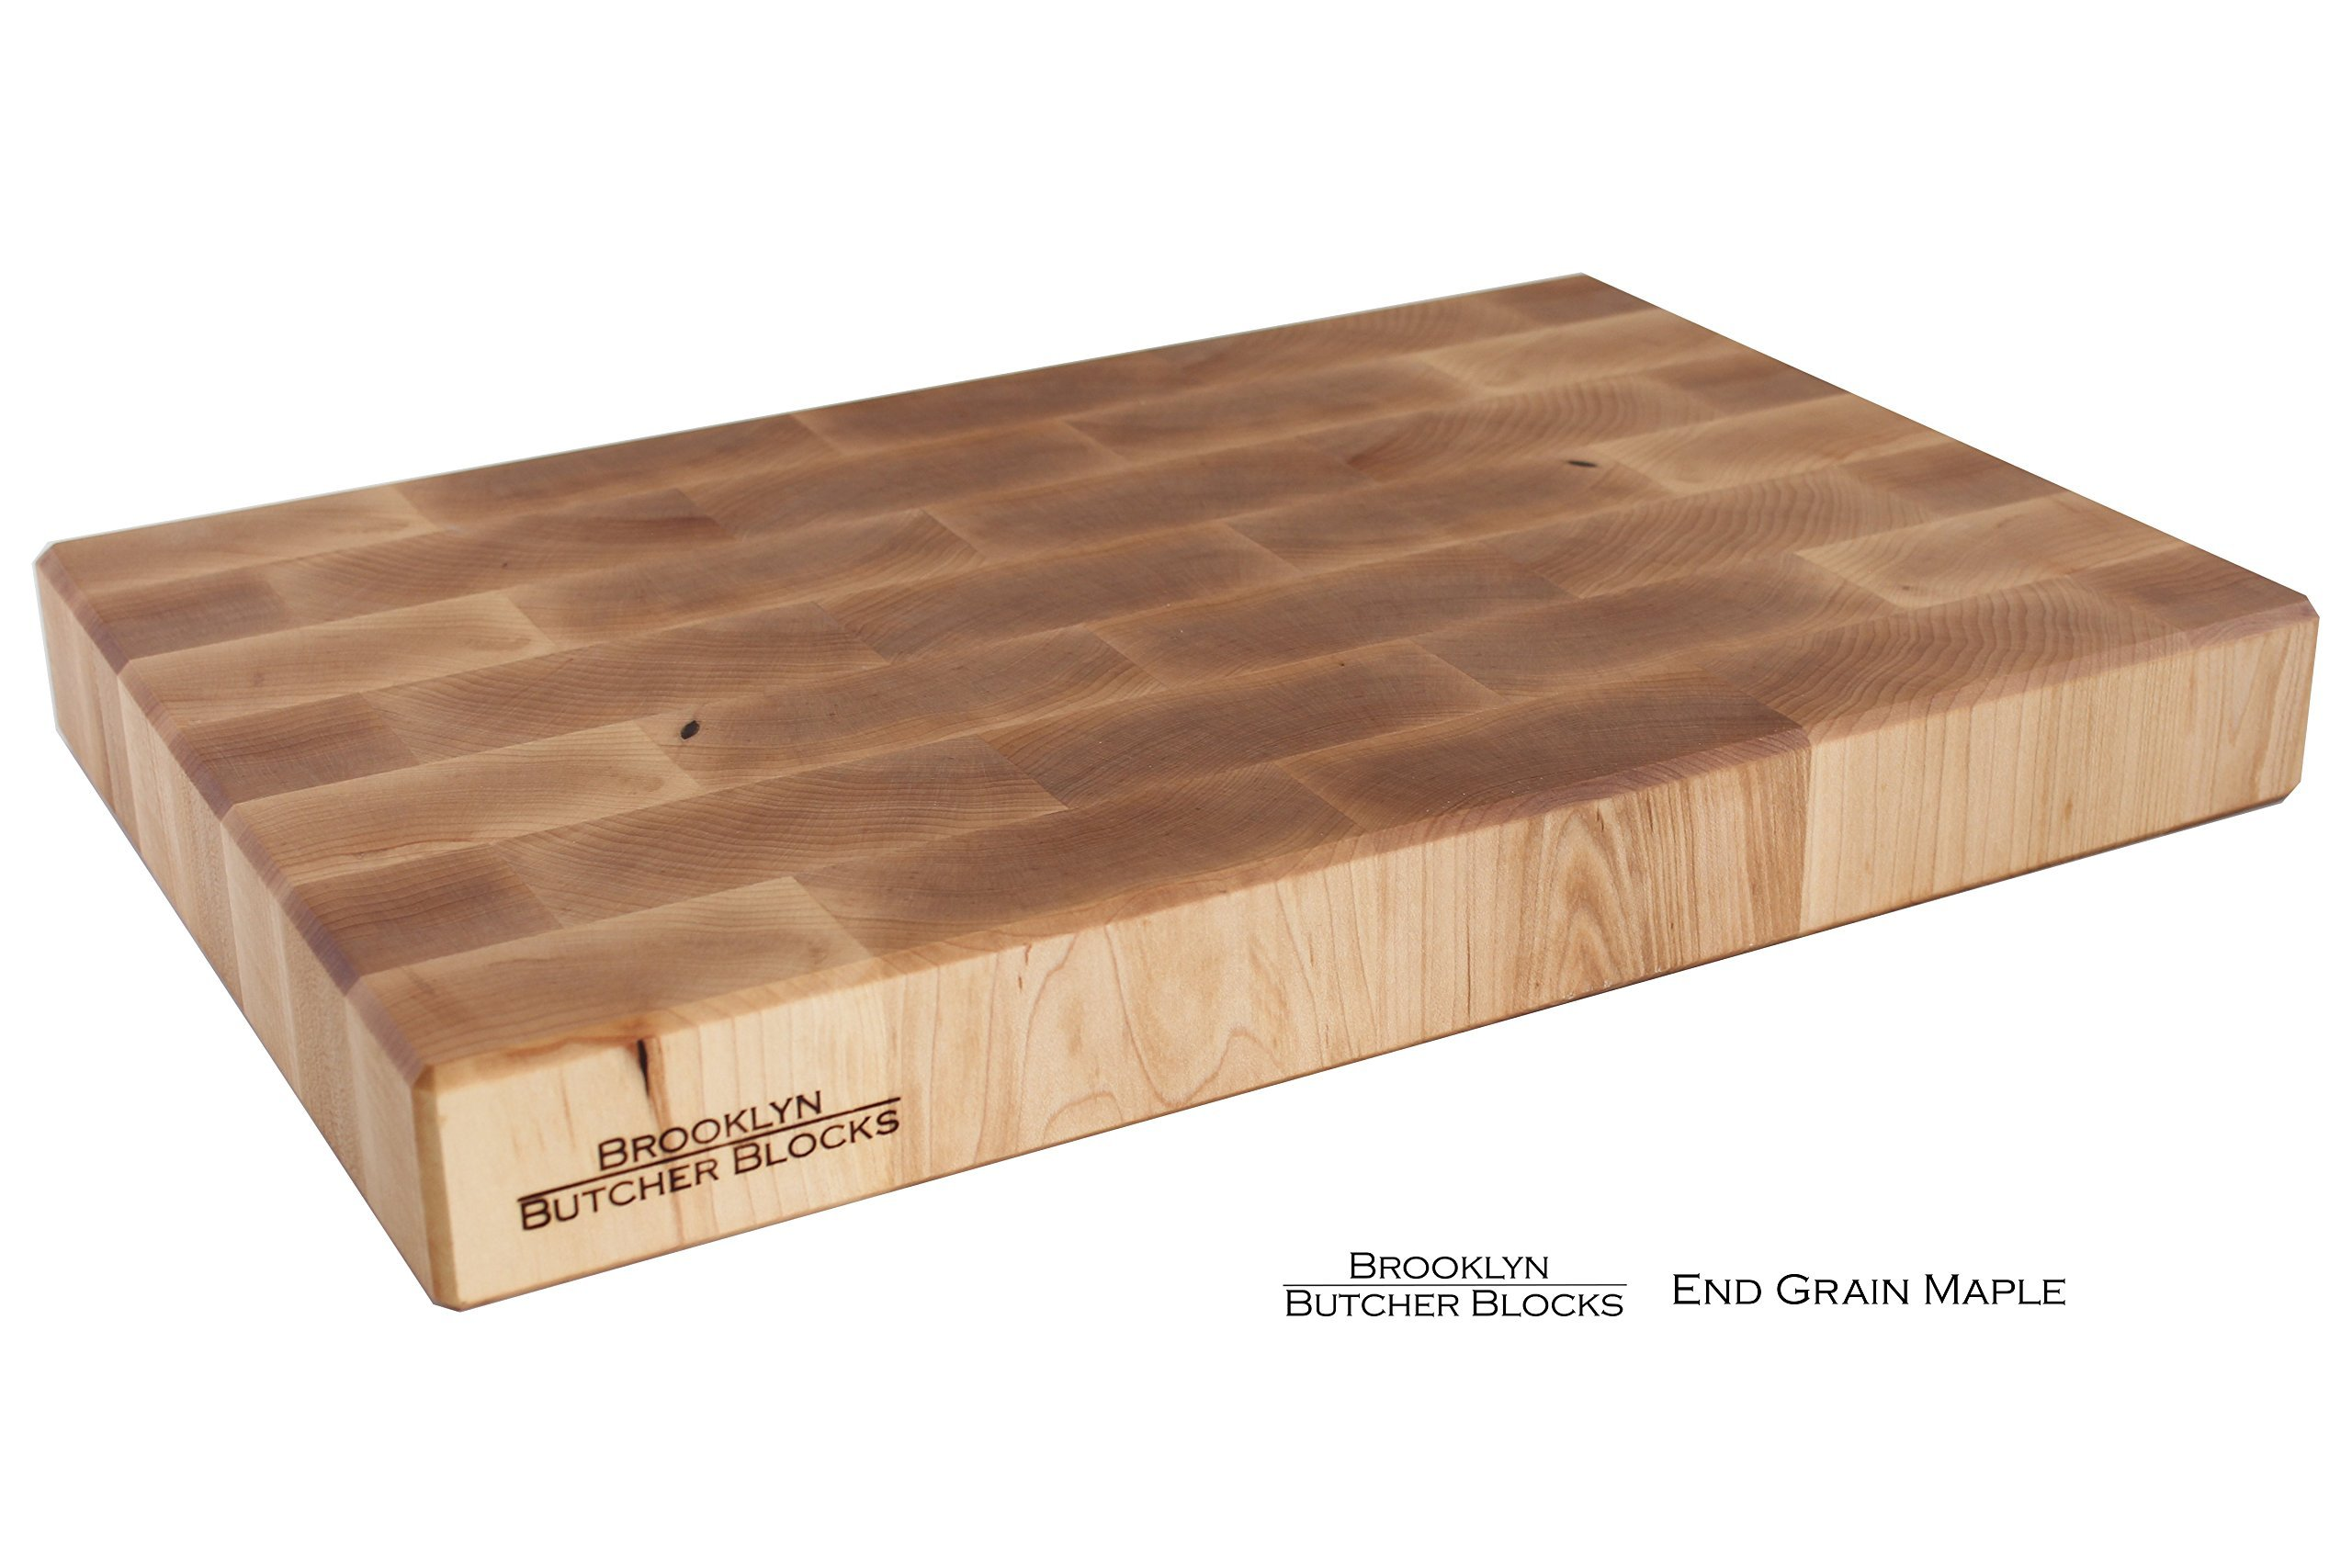 12 x 18 x 2 End Grain Brickwork Butcher Block by Brooklyn Butcher Blocks (Image #5)